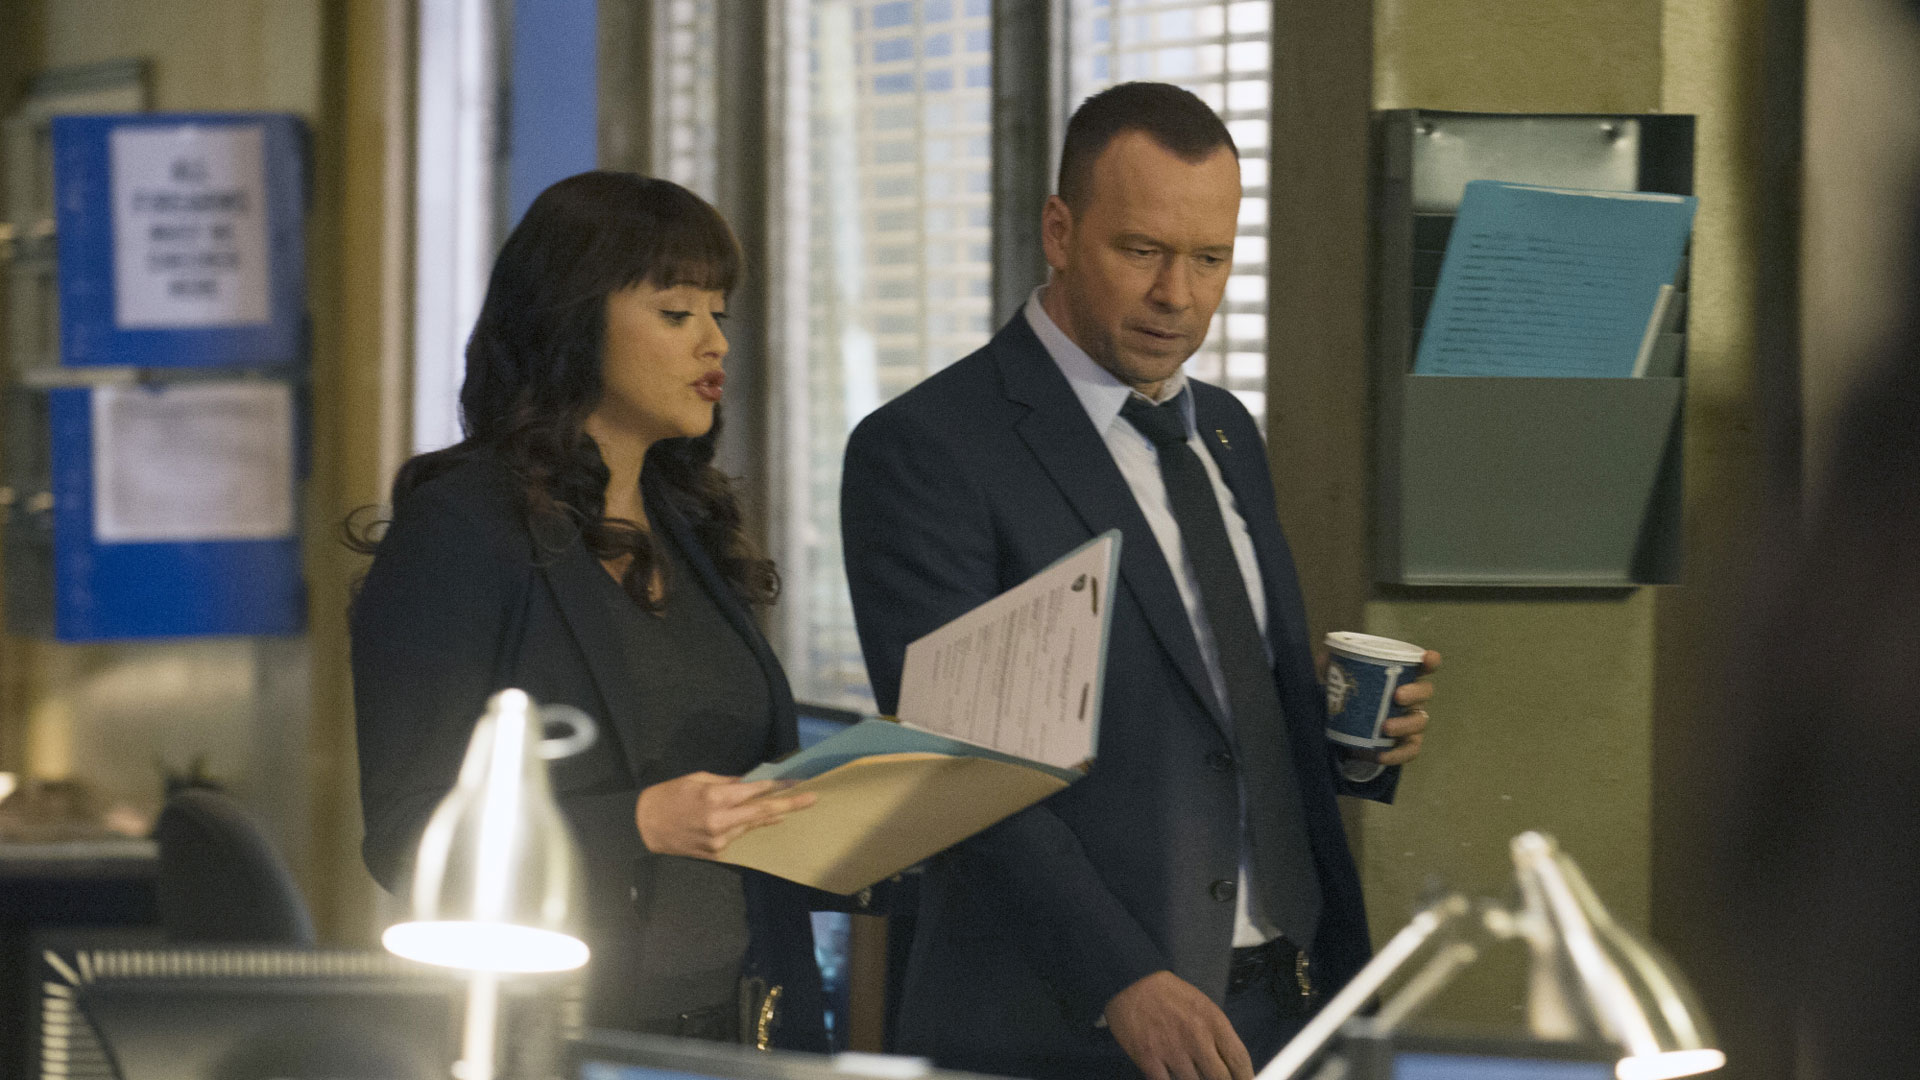 Marisa Ramirez as Detective Maria Baez and Donny Wahlberg as Detective Danny Reagan